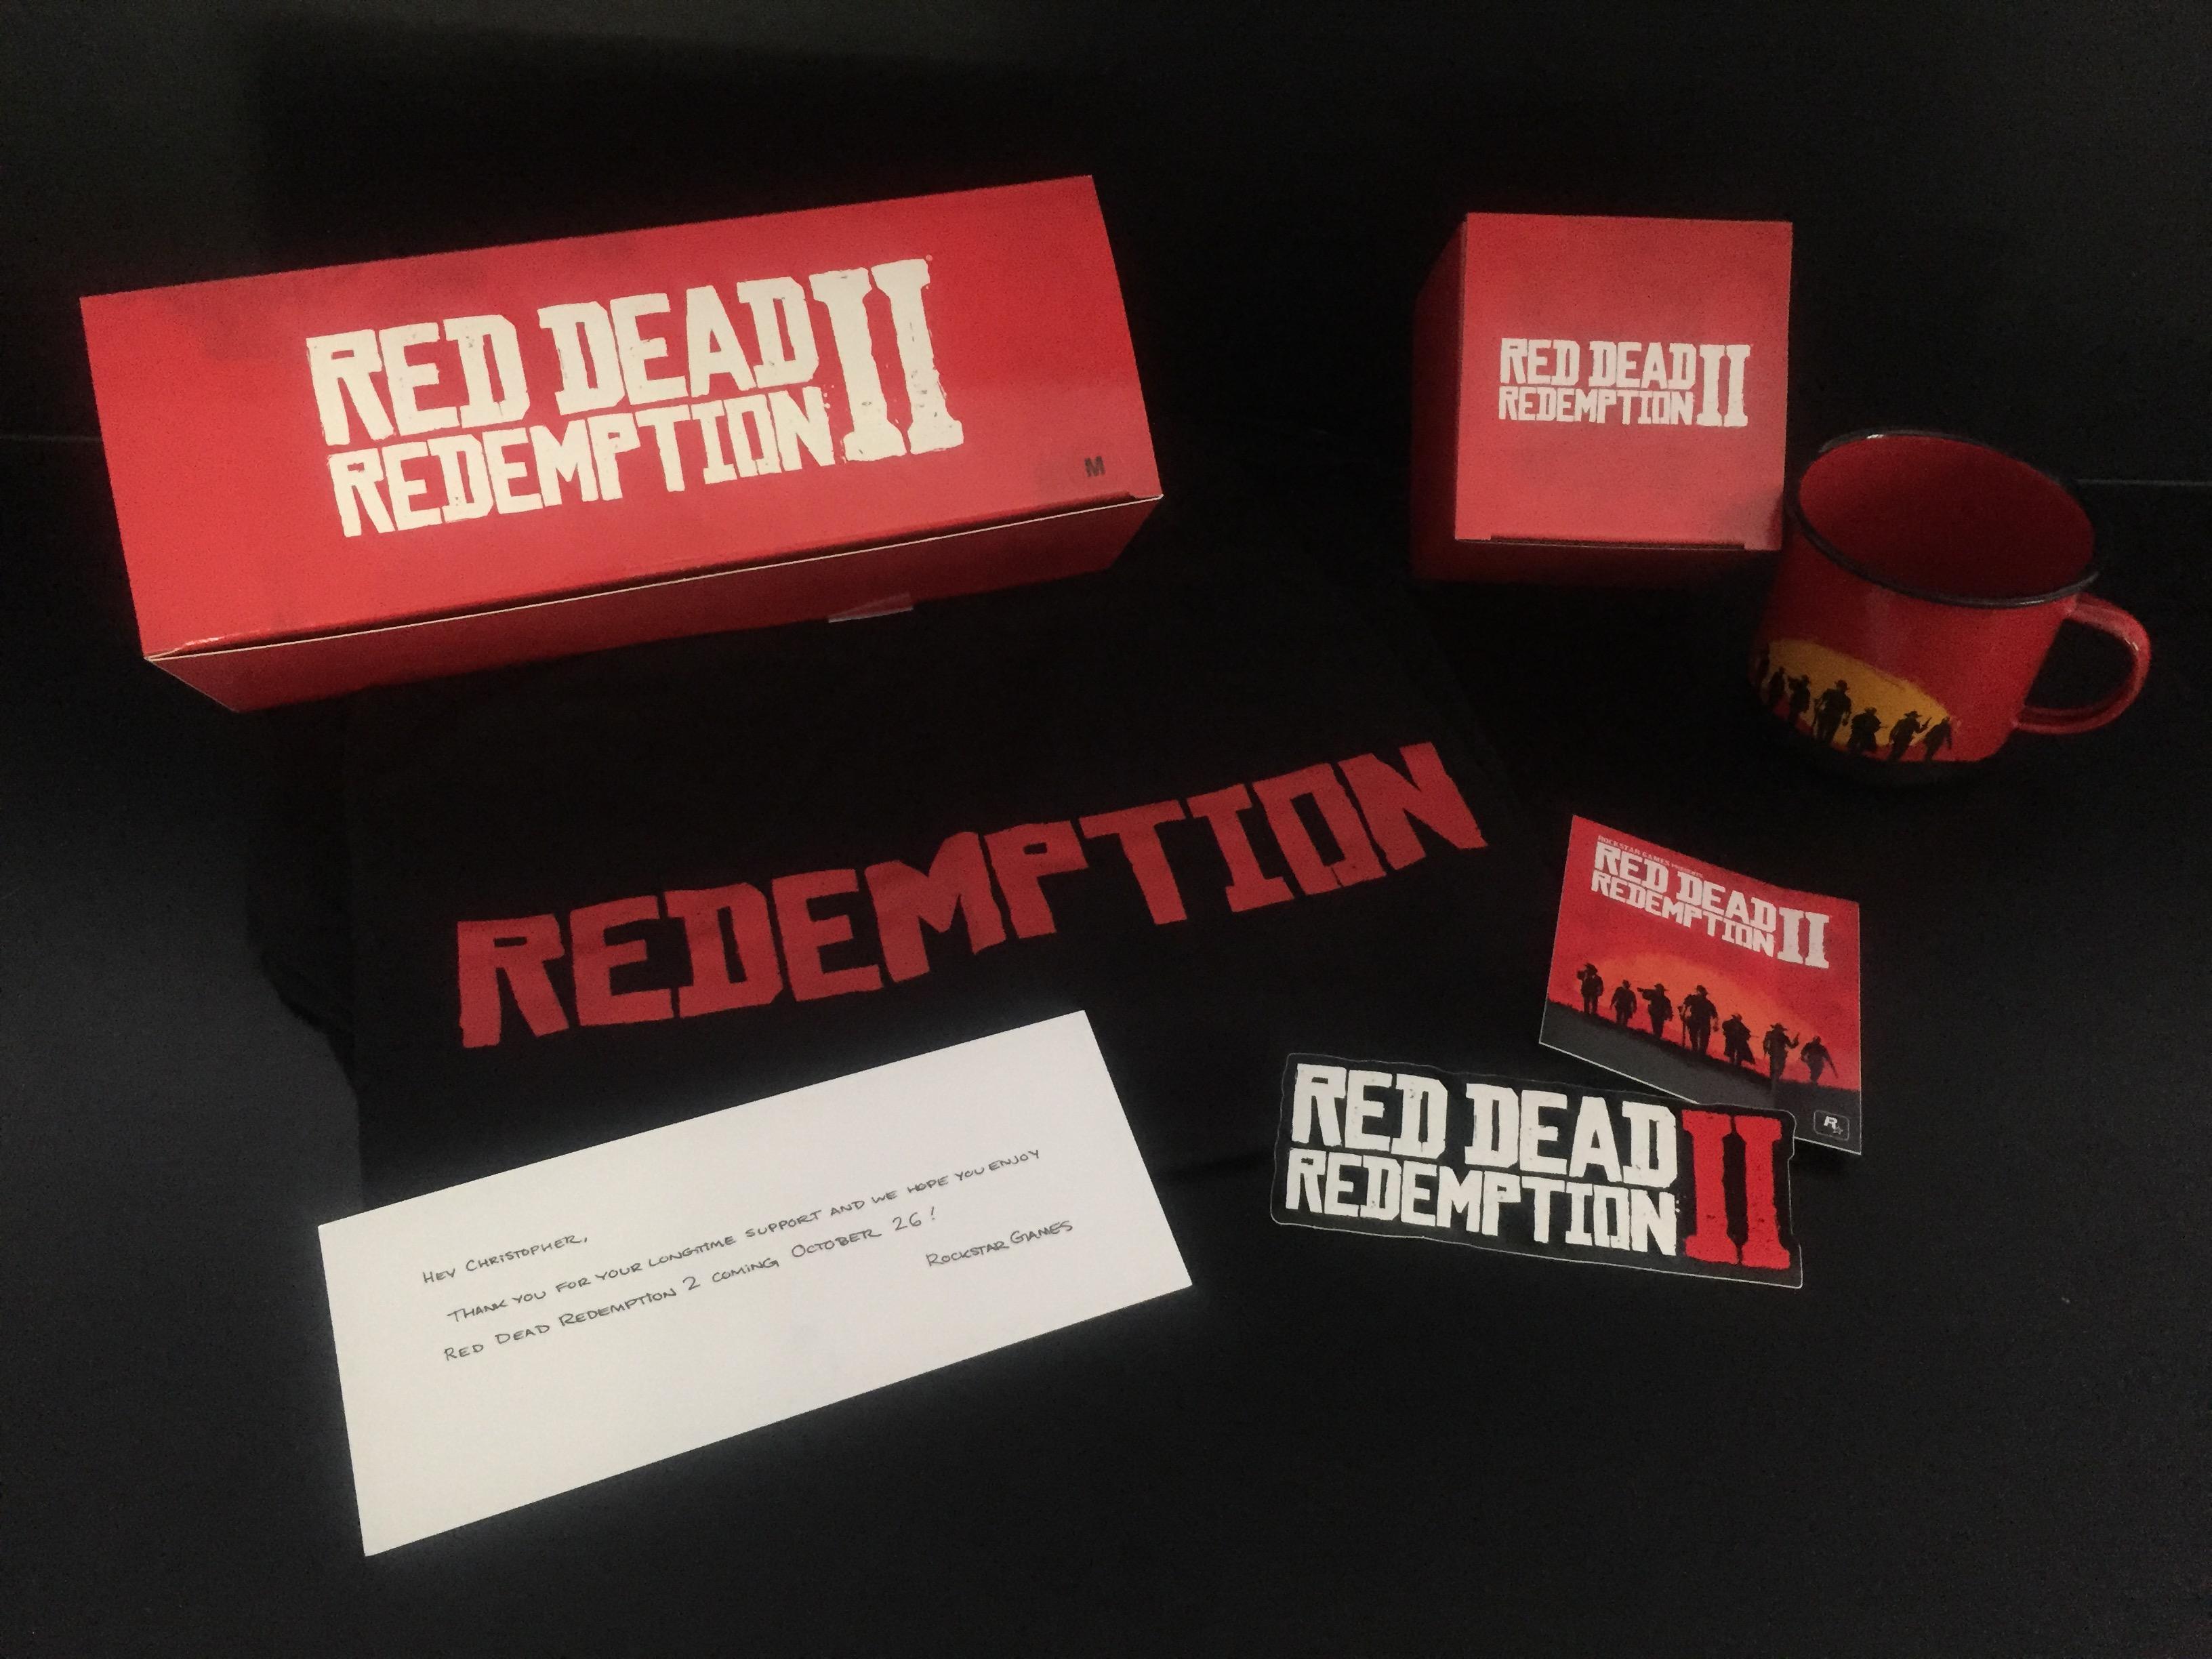 Colis Rockstar Games - Red Dead Redemption II - Contenu